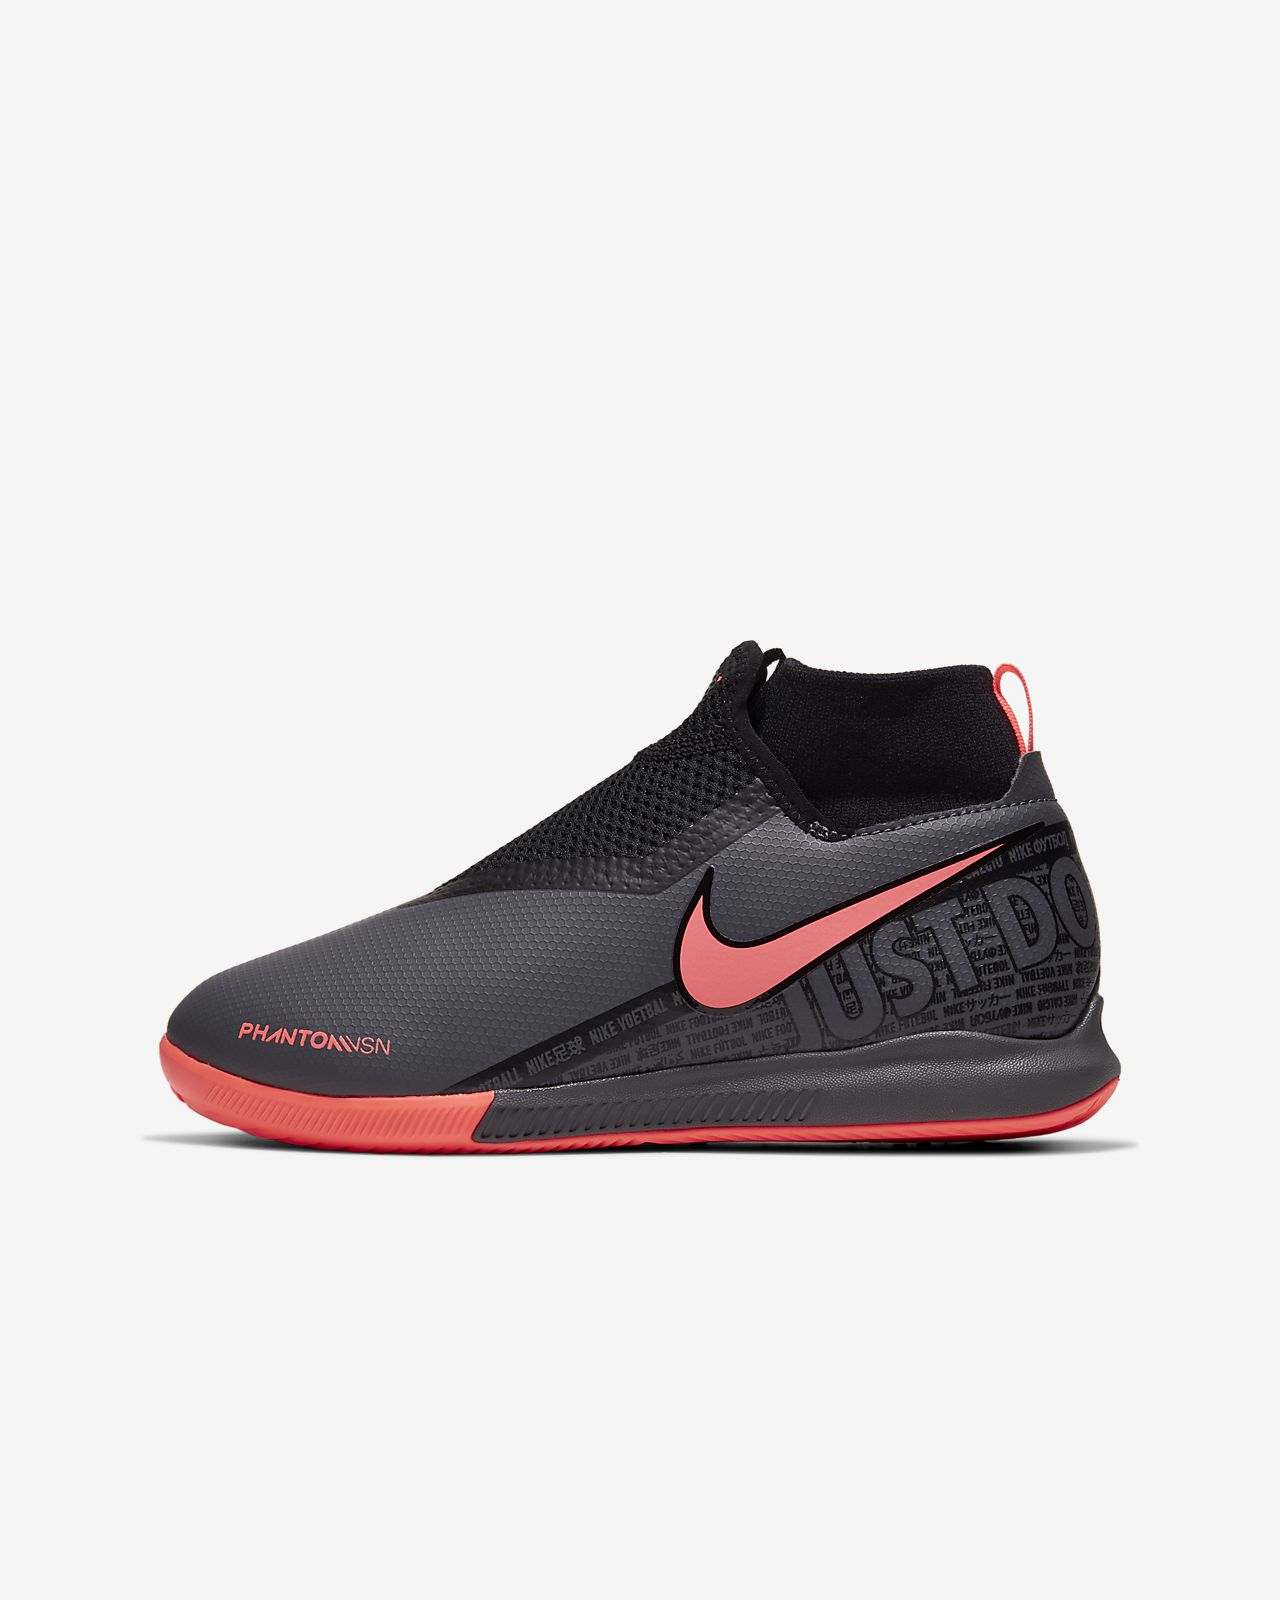 Nike Jr Phantom Vision Academy Dynamic Fit Ic Kinder Fussballschuh Fur Hallen Und Hartplatze